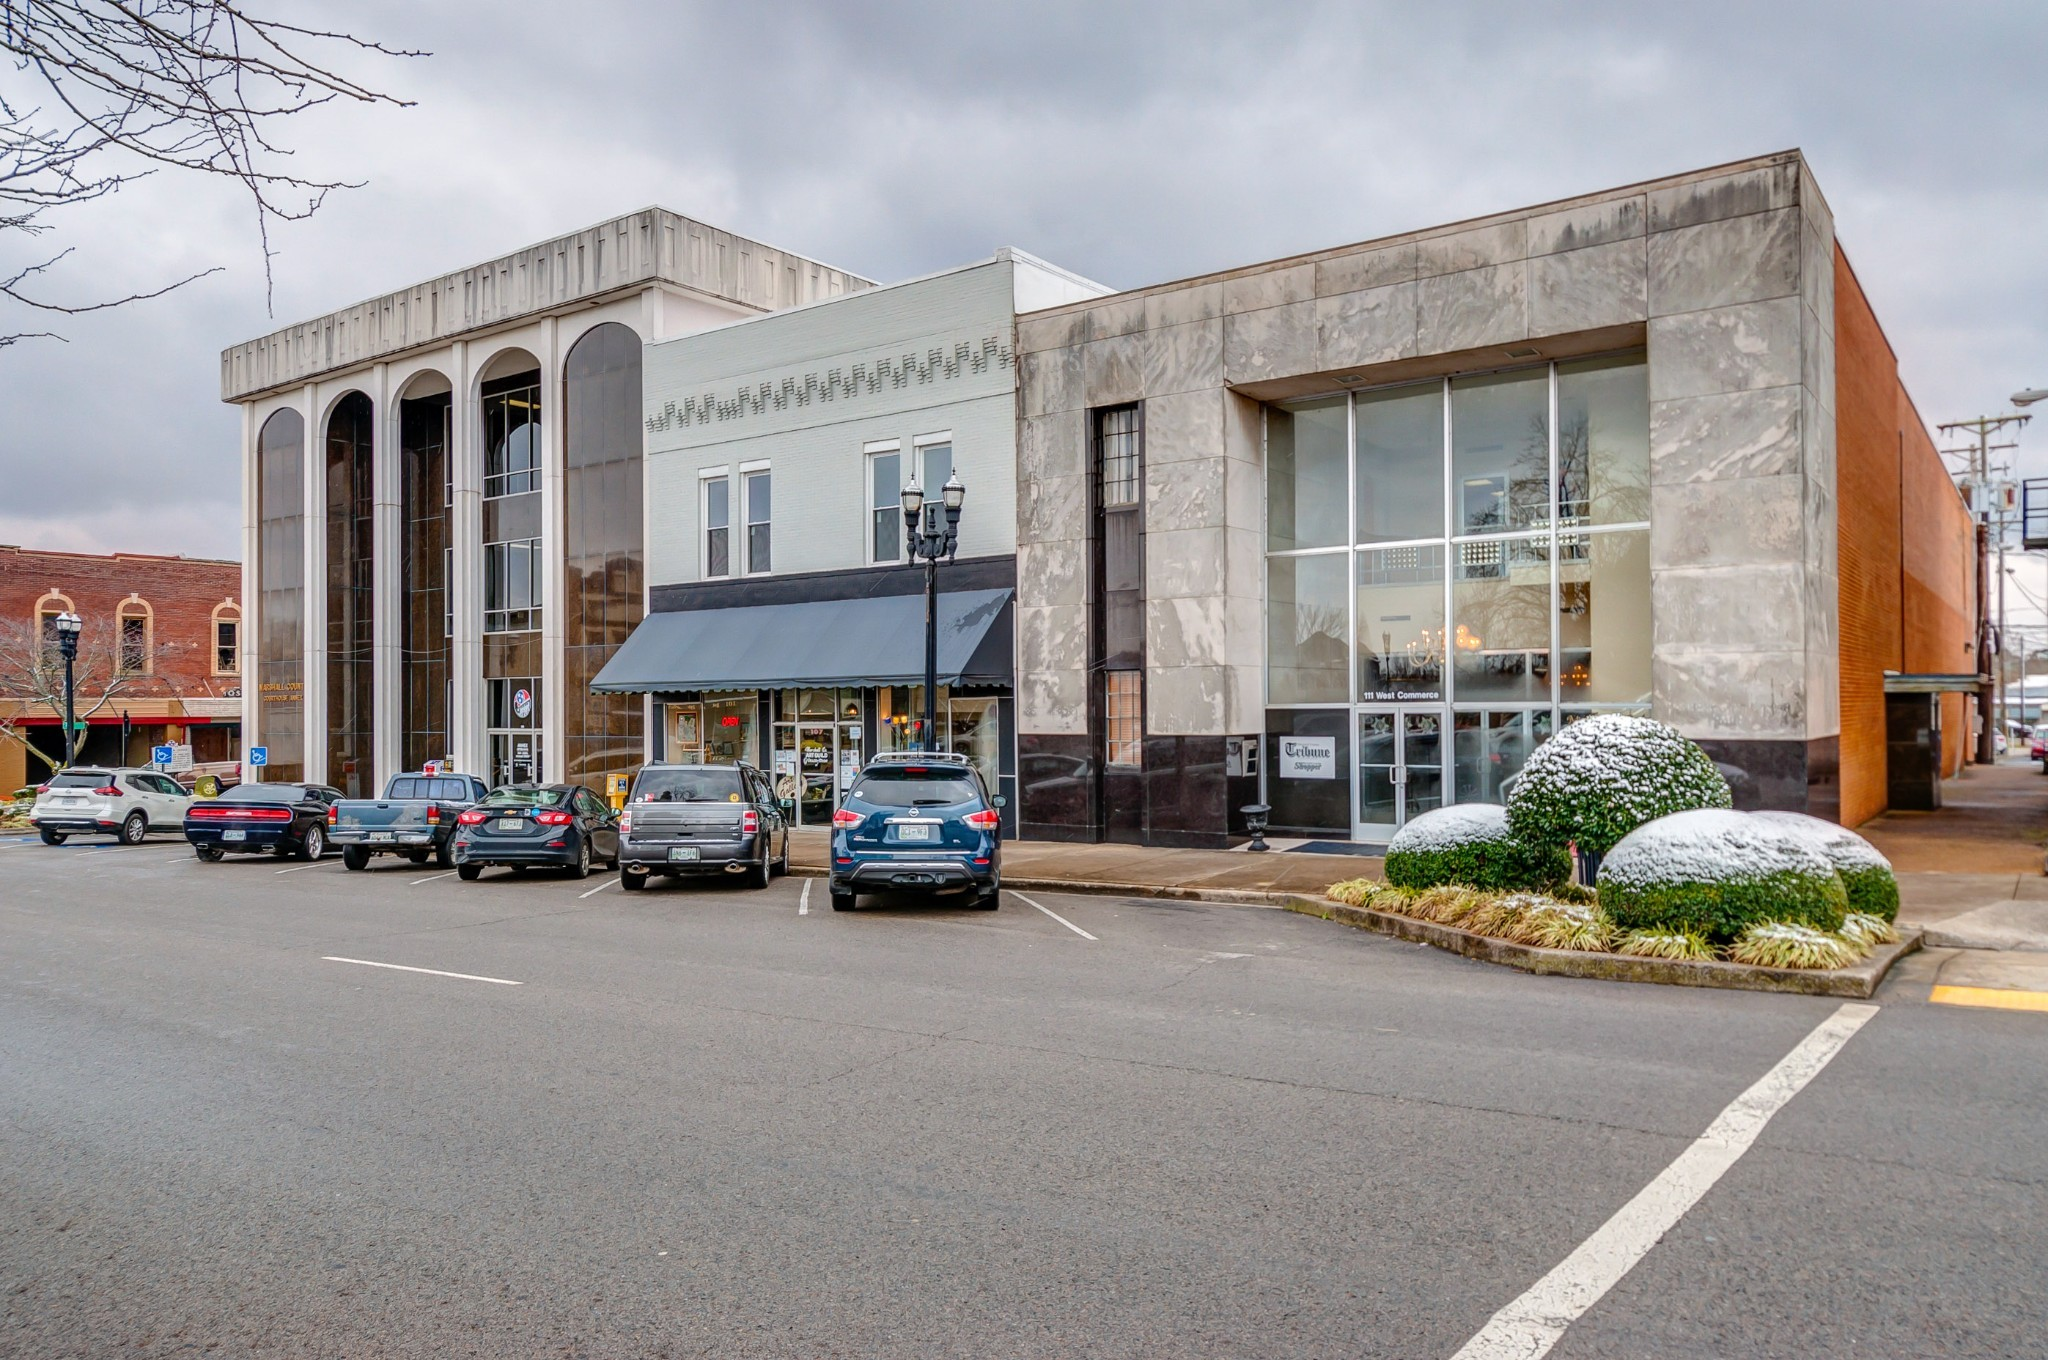 111 W Commerce St Property Photo - Lewisburg, TN real estate listing